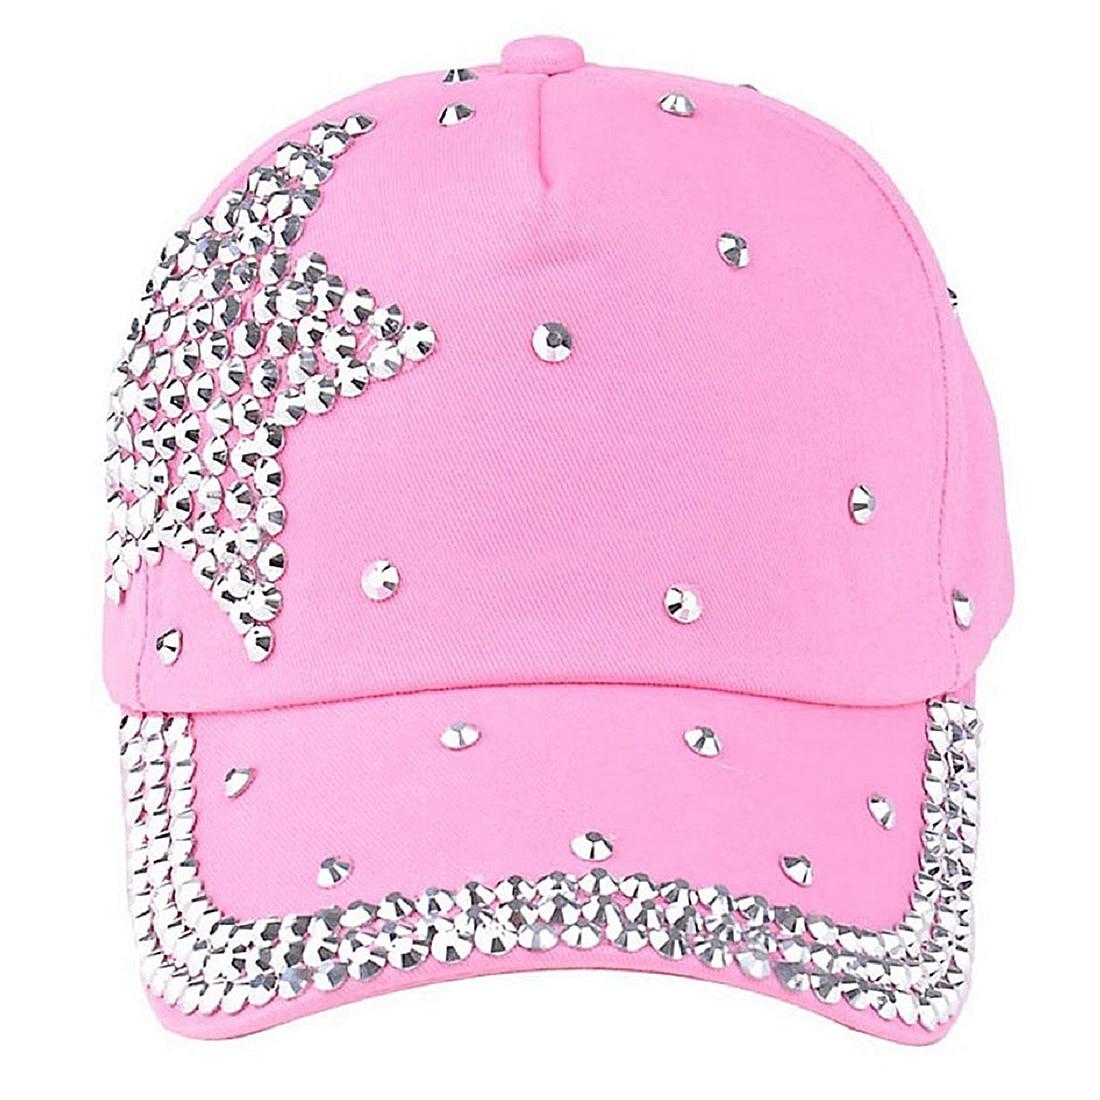 SAF-Baseball Cap Rhinestone Star Shaped Boy Girls Snapback Hat Pink